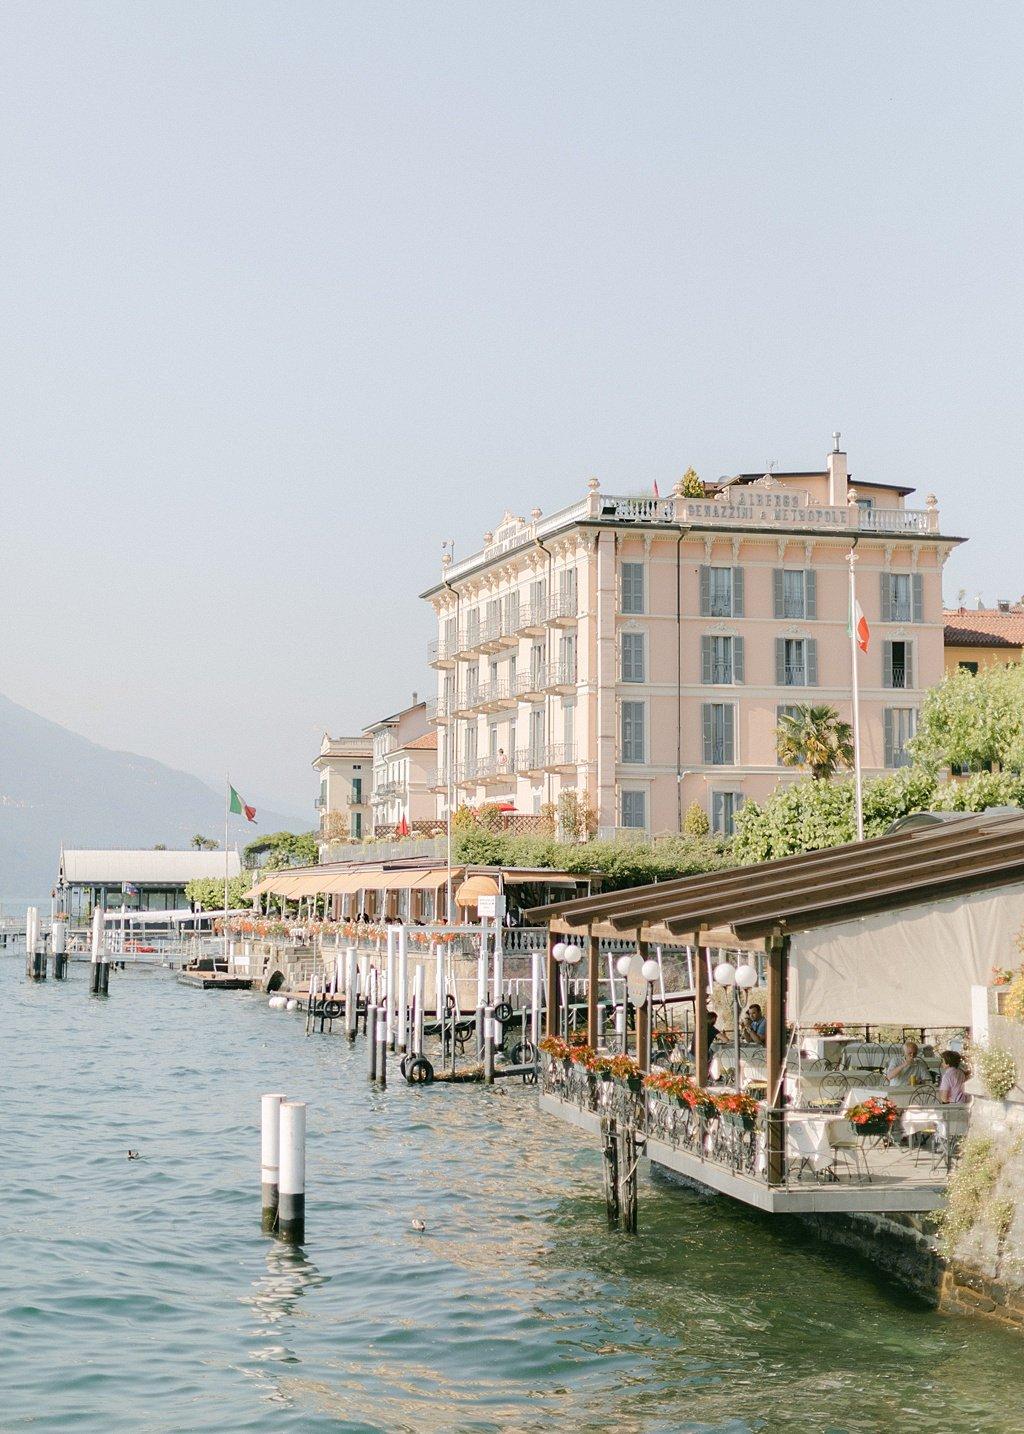 Bellagio Docking